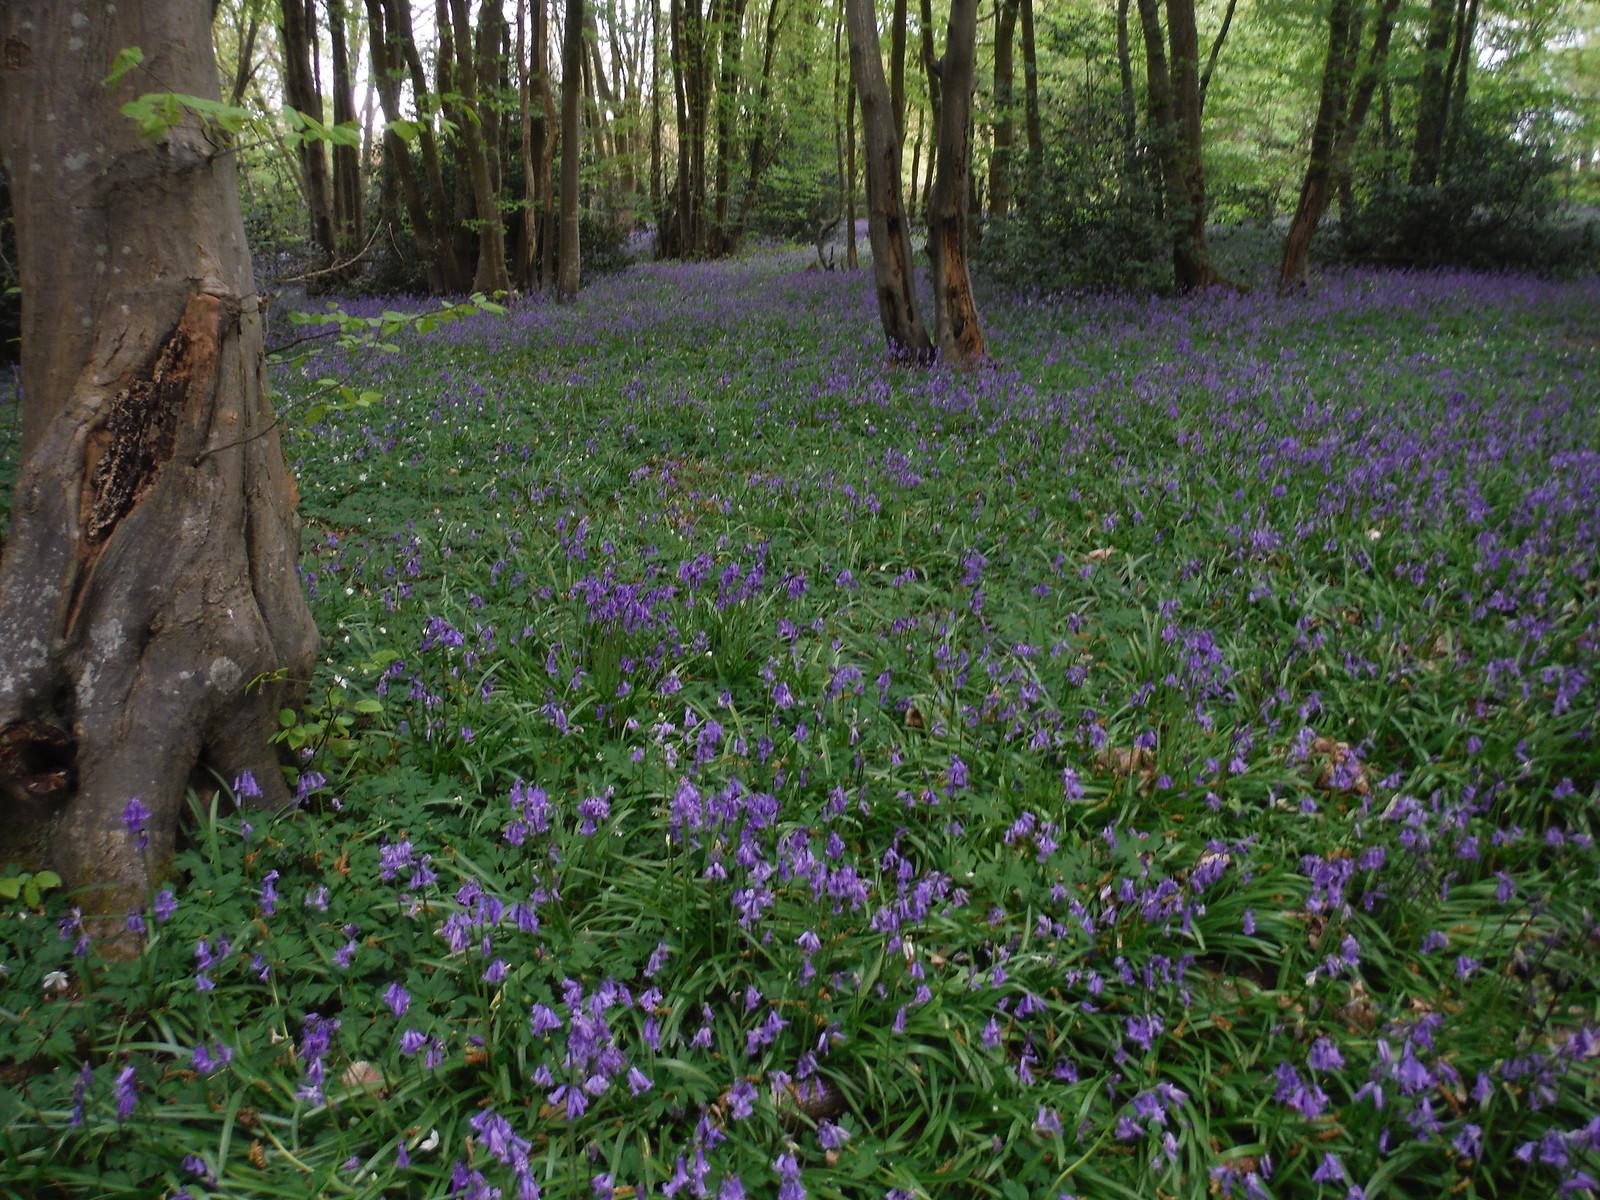 Bluebells in Unnamed Wood near Owlsbury Farm SWC Walk 272 Uckfield to Lewes